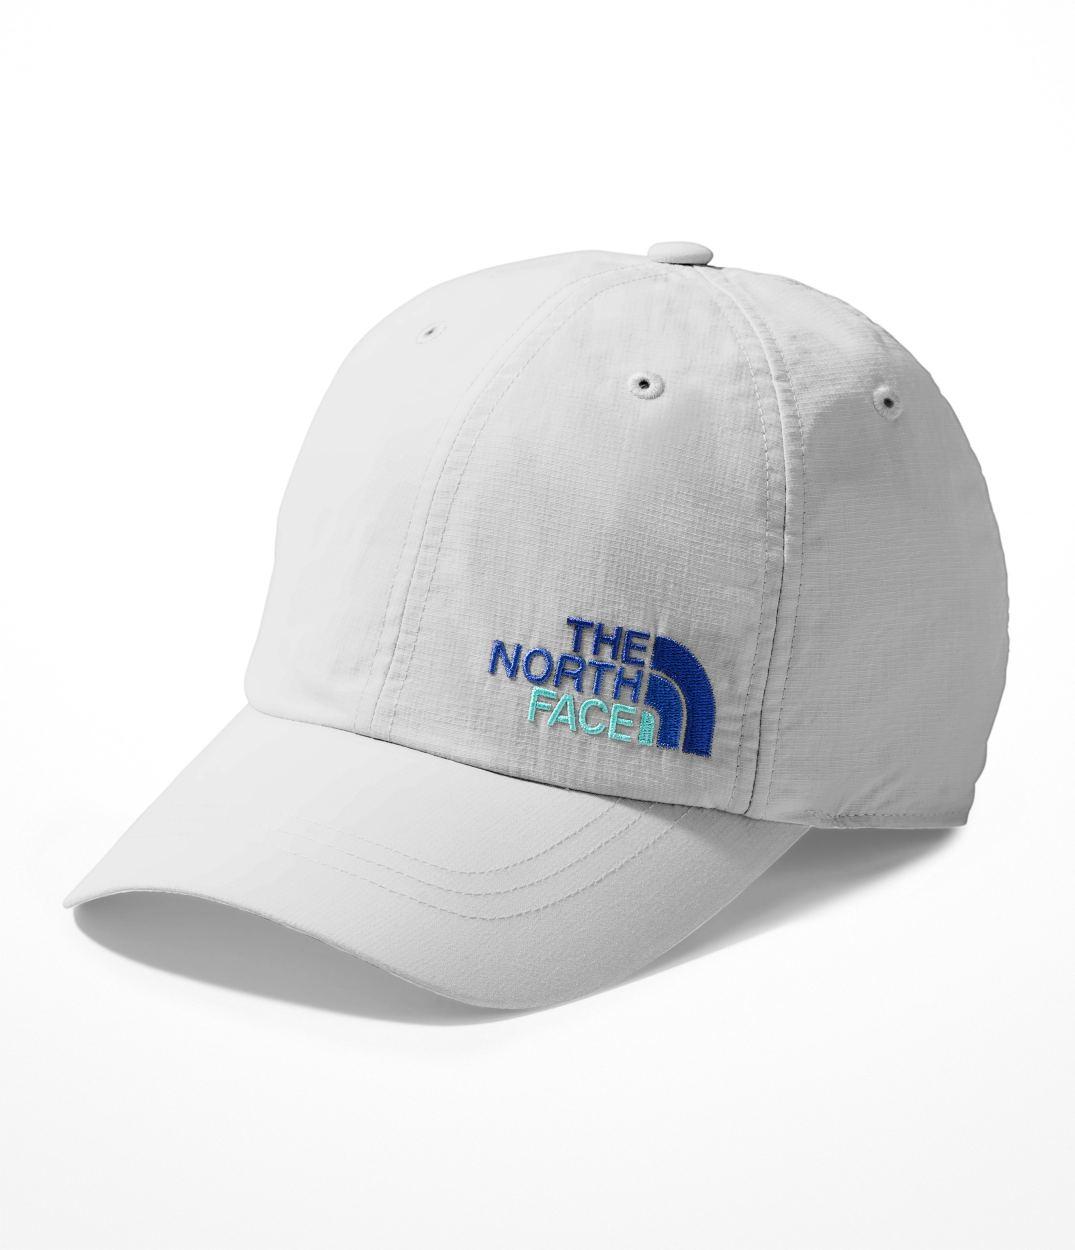 The North Face-Horizon Ball Cap - Women's